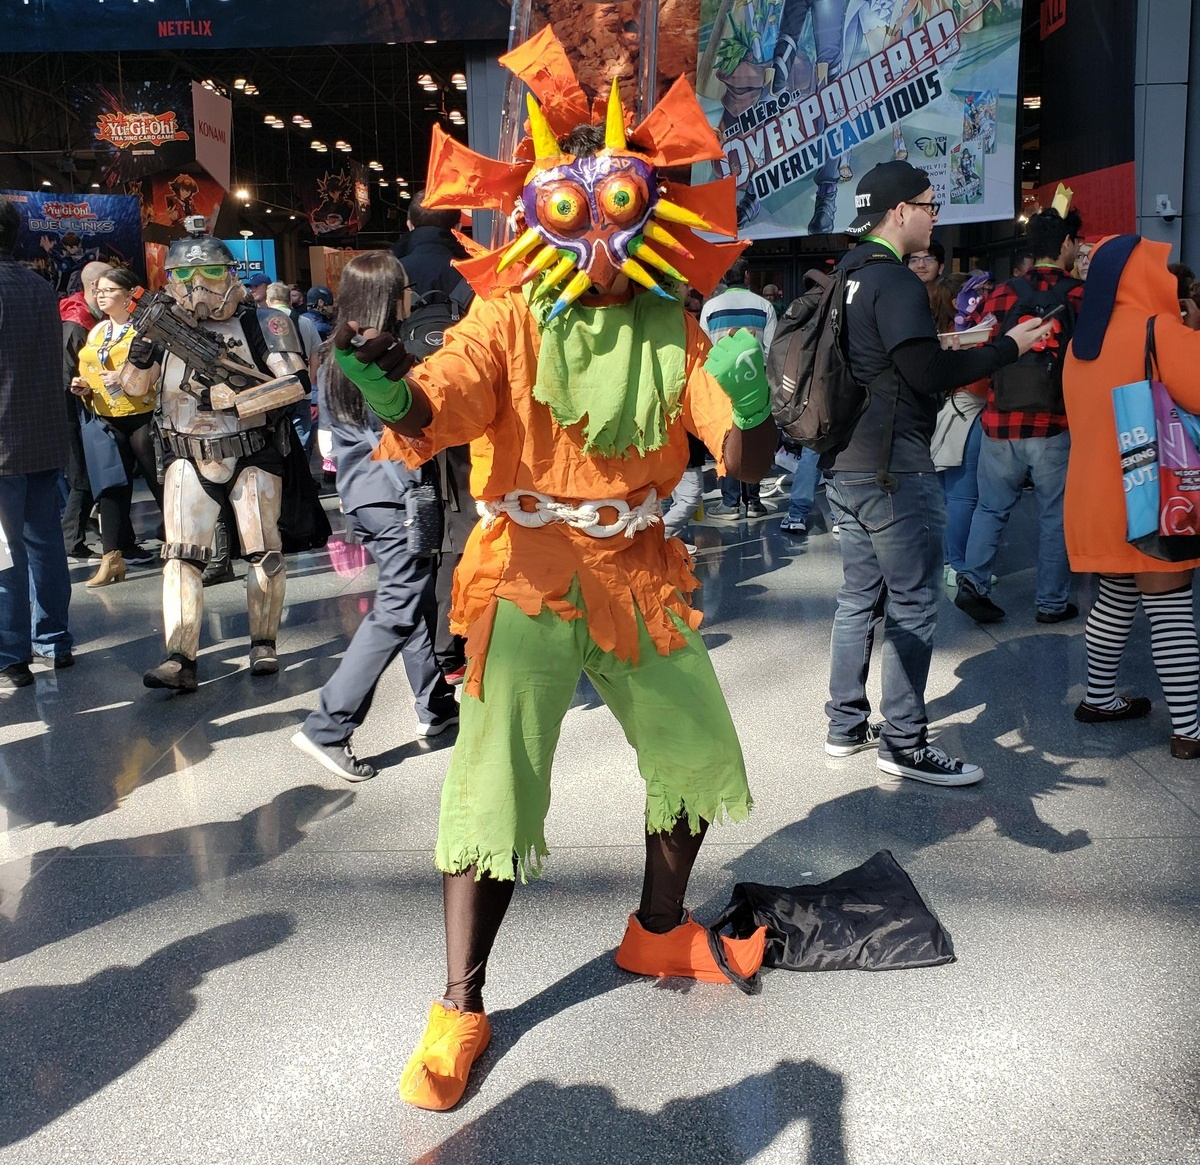 Креативные косплеи с «Comic Con-2019» в Нью-Йорке